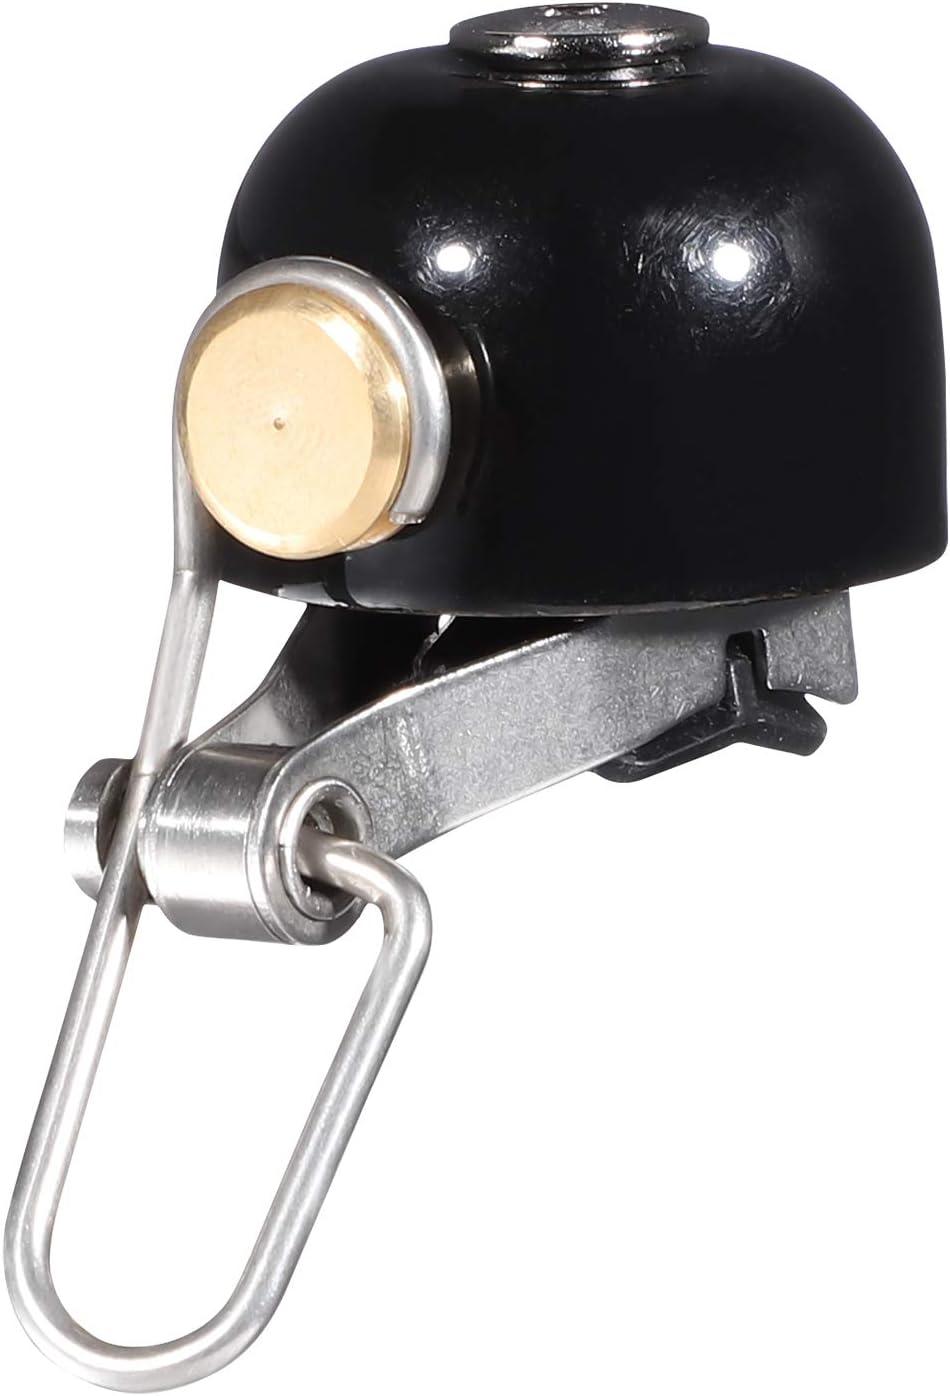 Classic Retro Metal Ring Bike Bicycle Cycling Handlebar Bell Sound Alarm Sil`CA